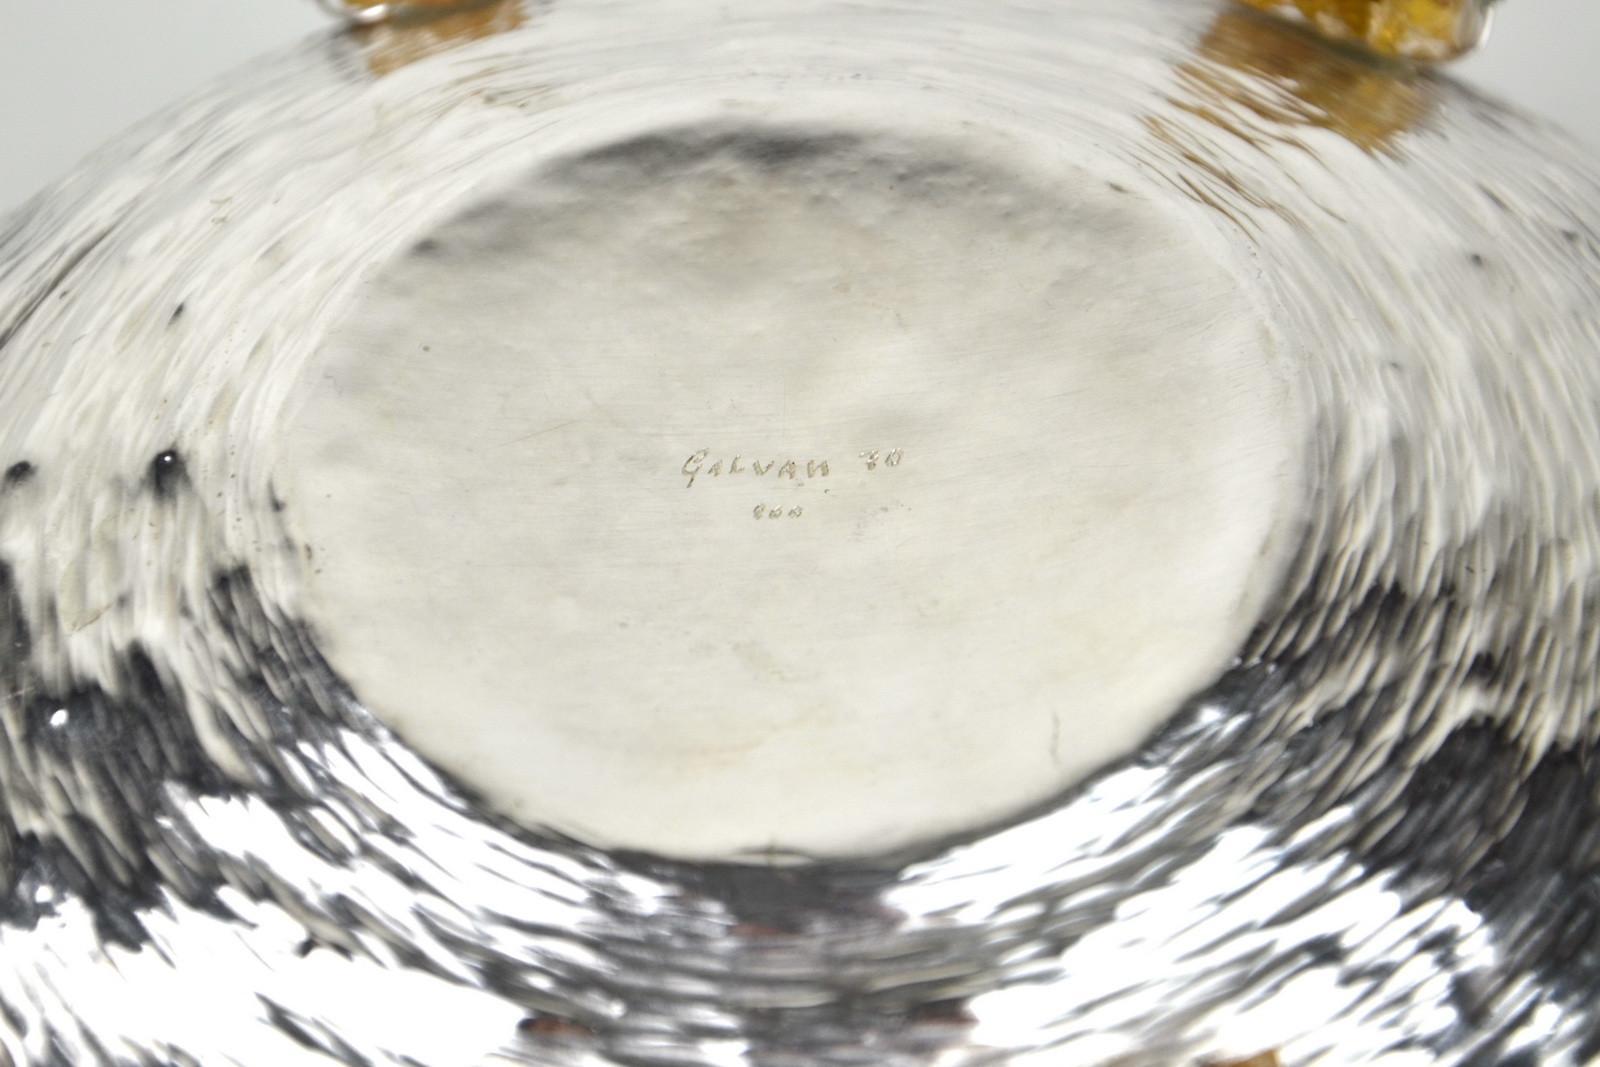 centrotavola-argento-galvan-70-con-pietre-1,2027.jpg?WebbinsCacheCounter=1